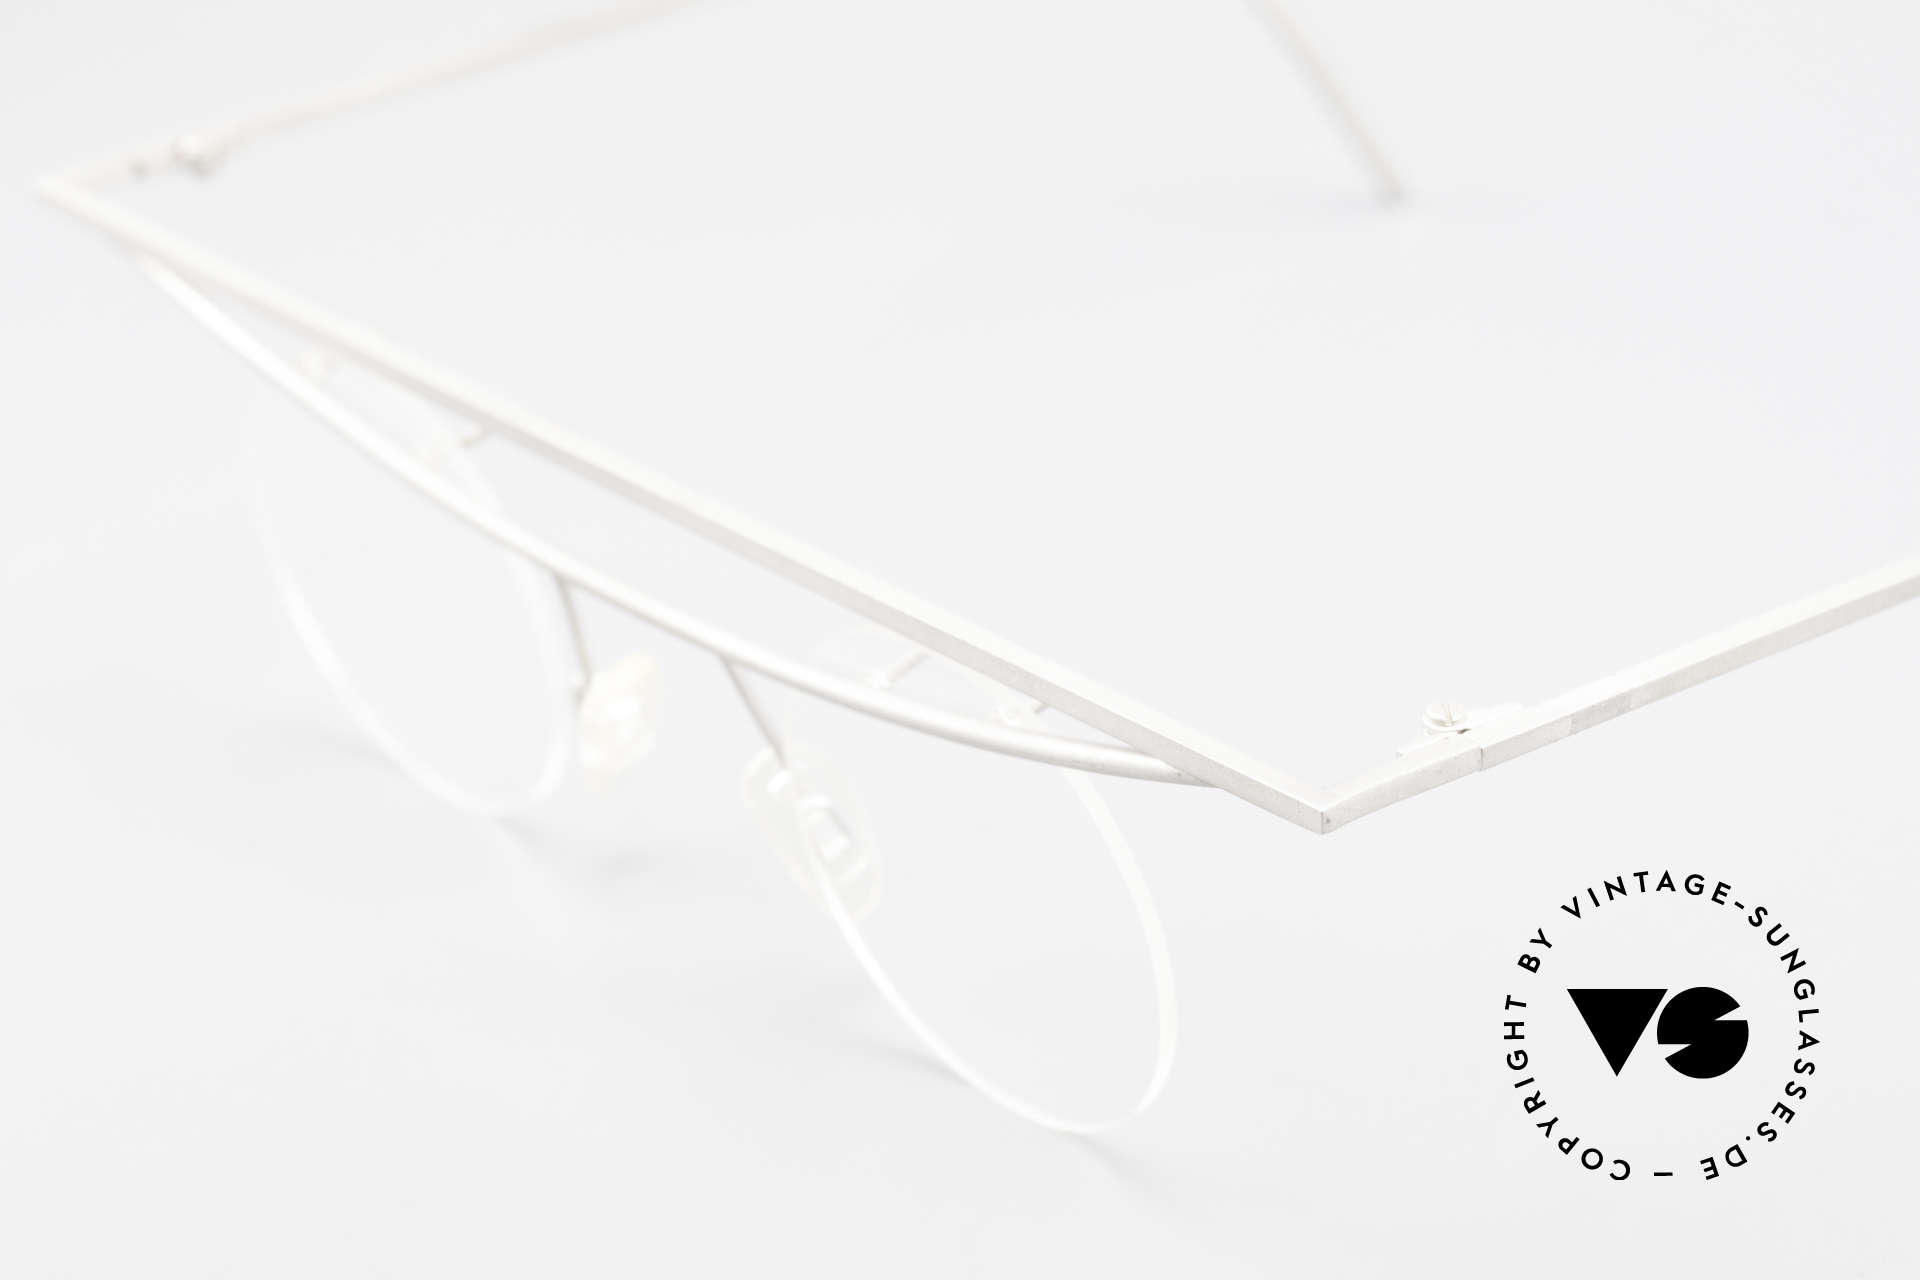 B. Angeletti Cesna Vintage Architect's Glasses XL, true rarity, handmade, vertu, for all lovers of design, Made for Men and Women